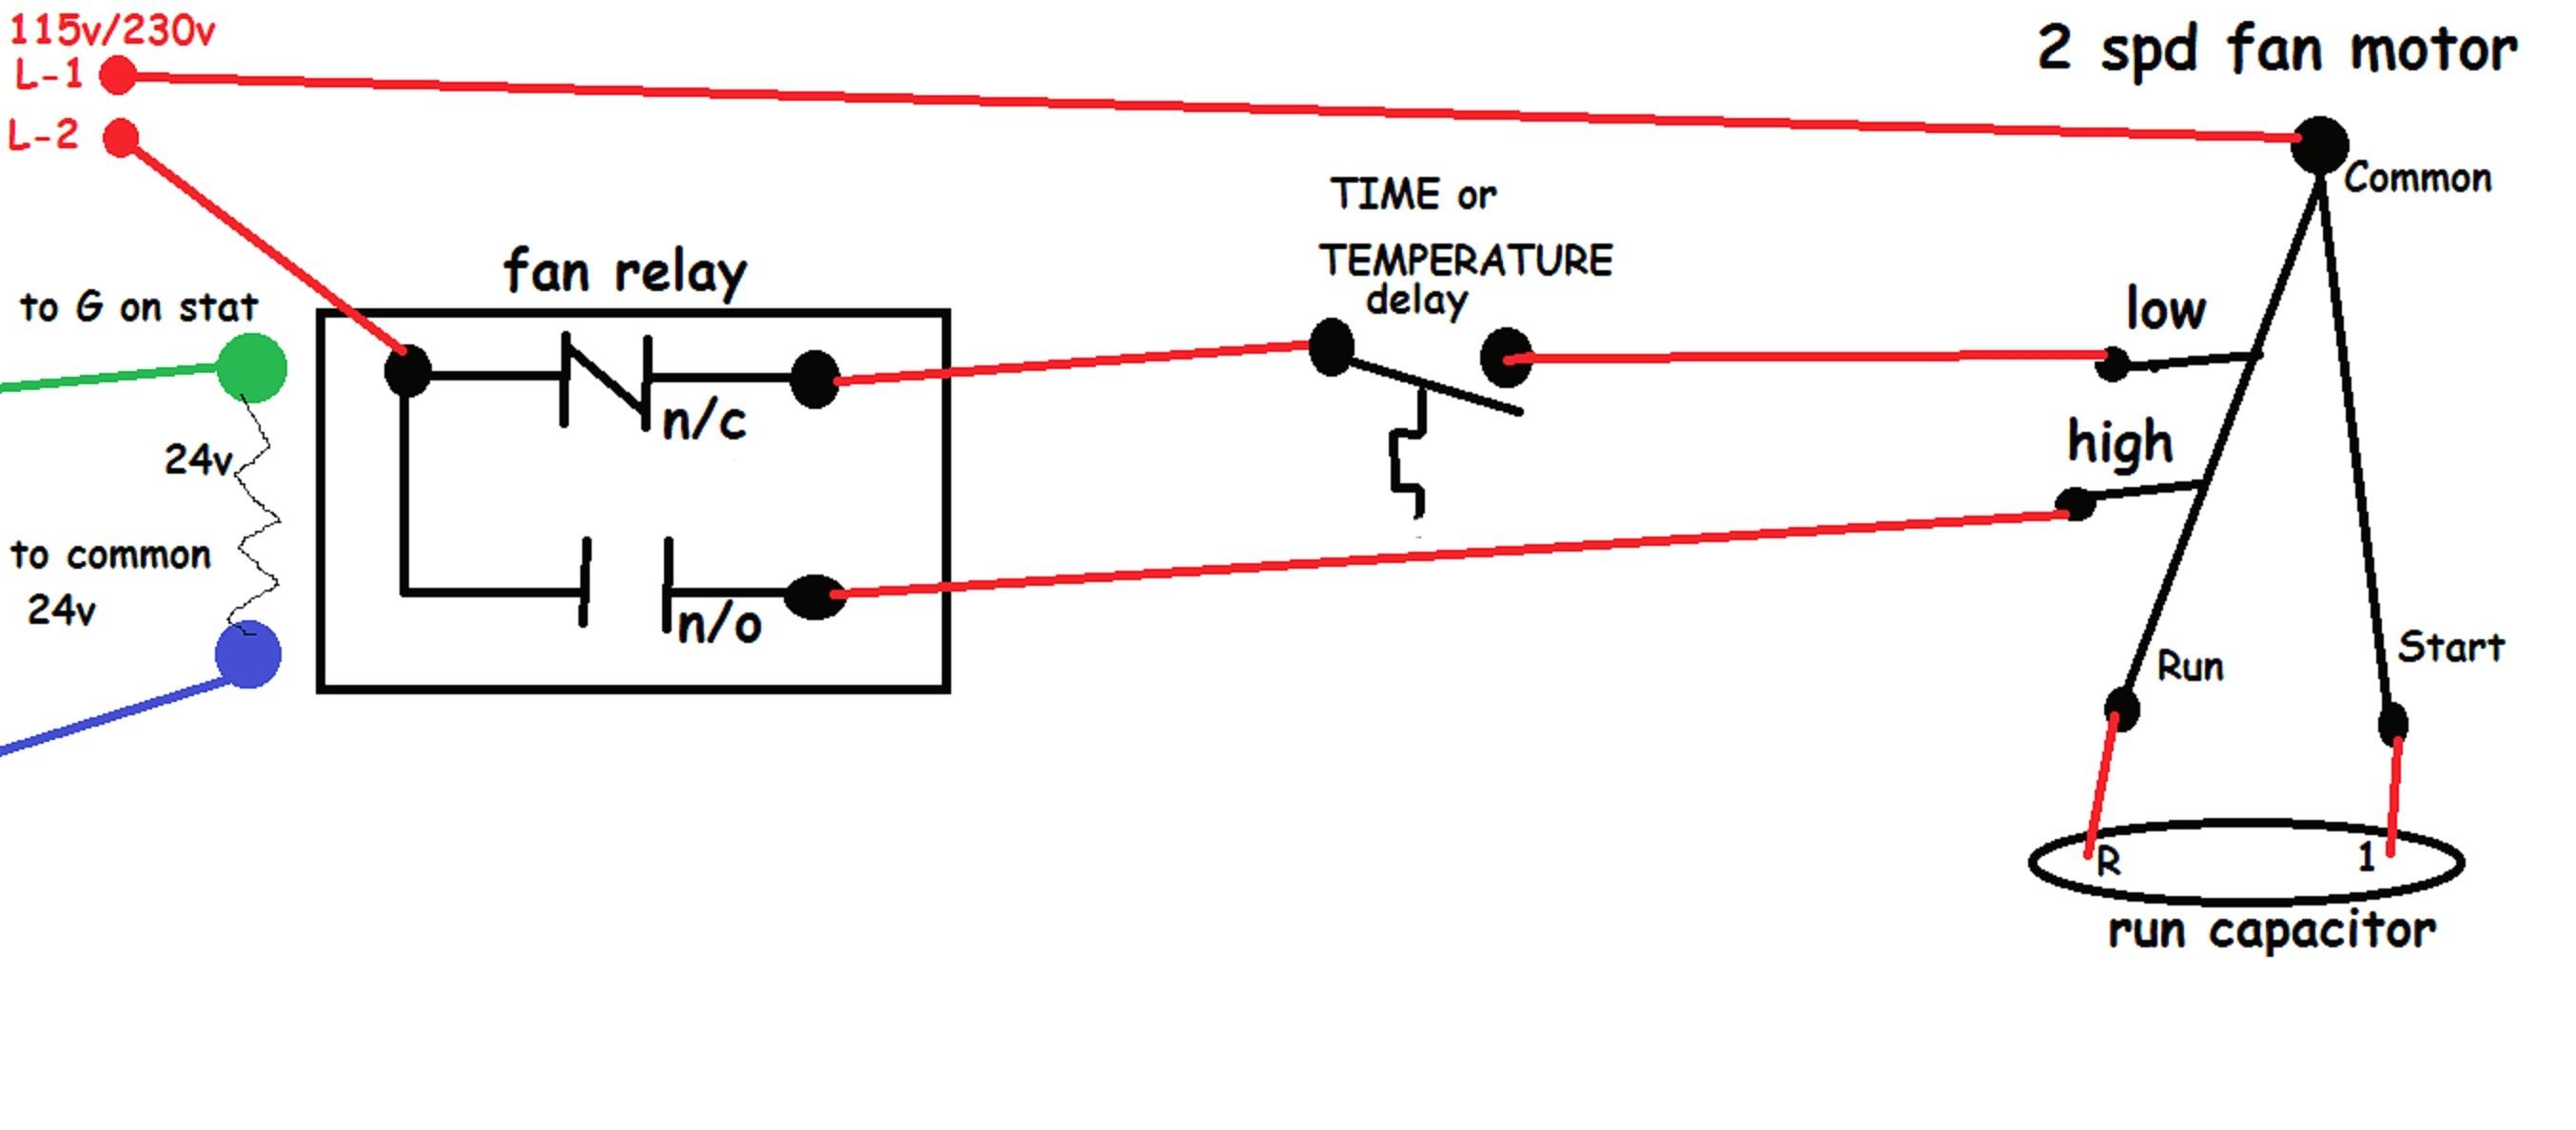 hvac fan relay wiring diagram Download-Hvac Fan Wiring Diagram Valid Fan Relay Wiring Diagram Wiring 13-b